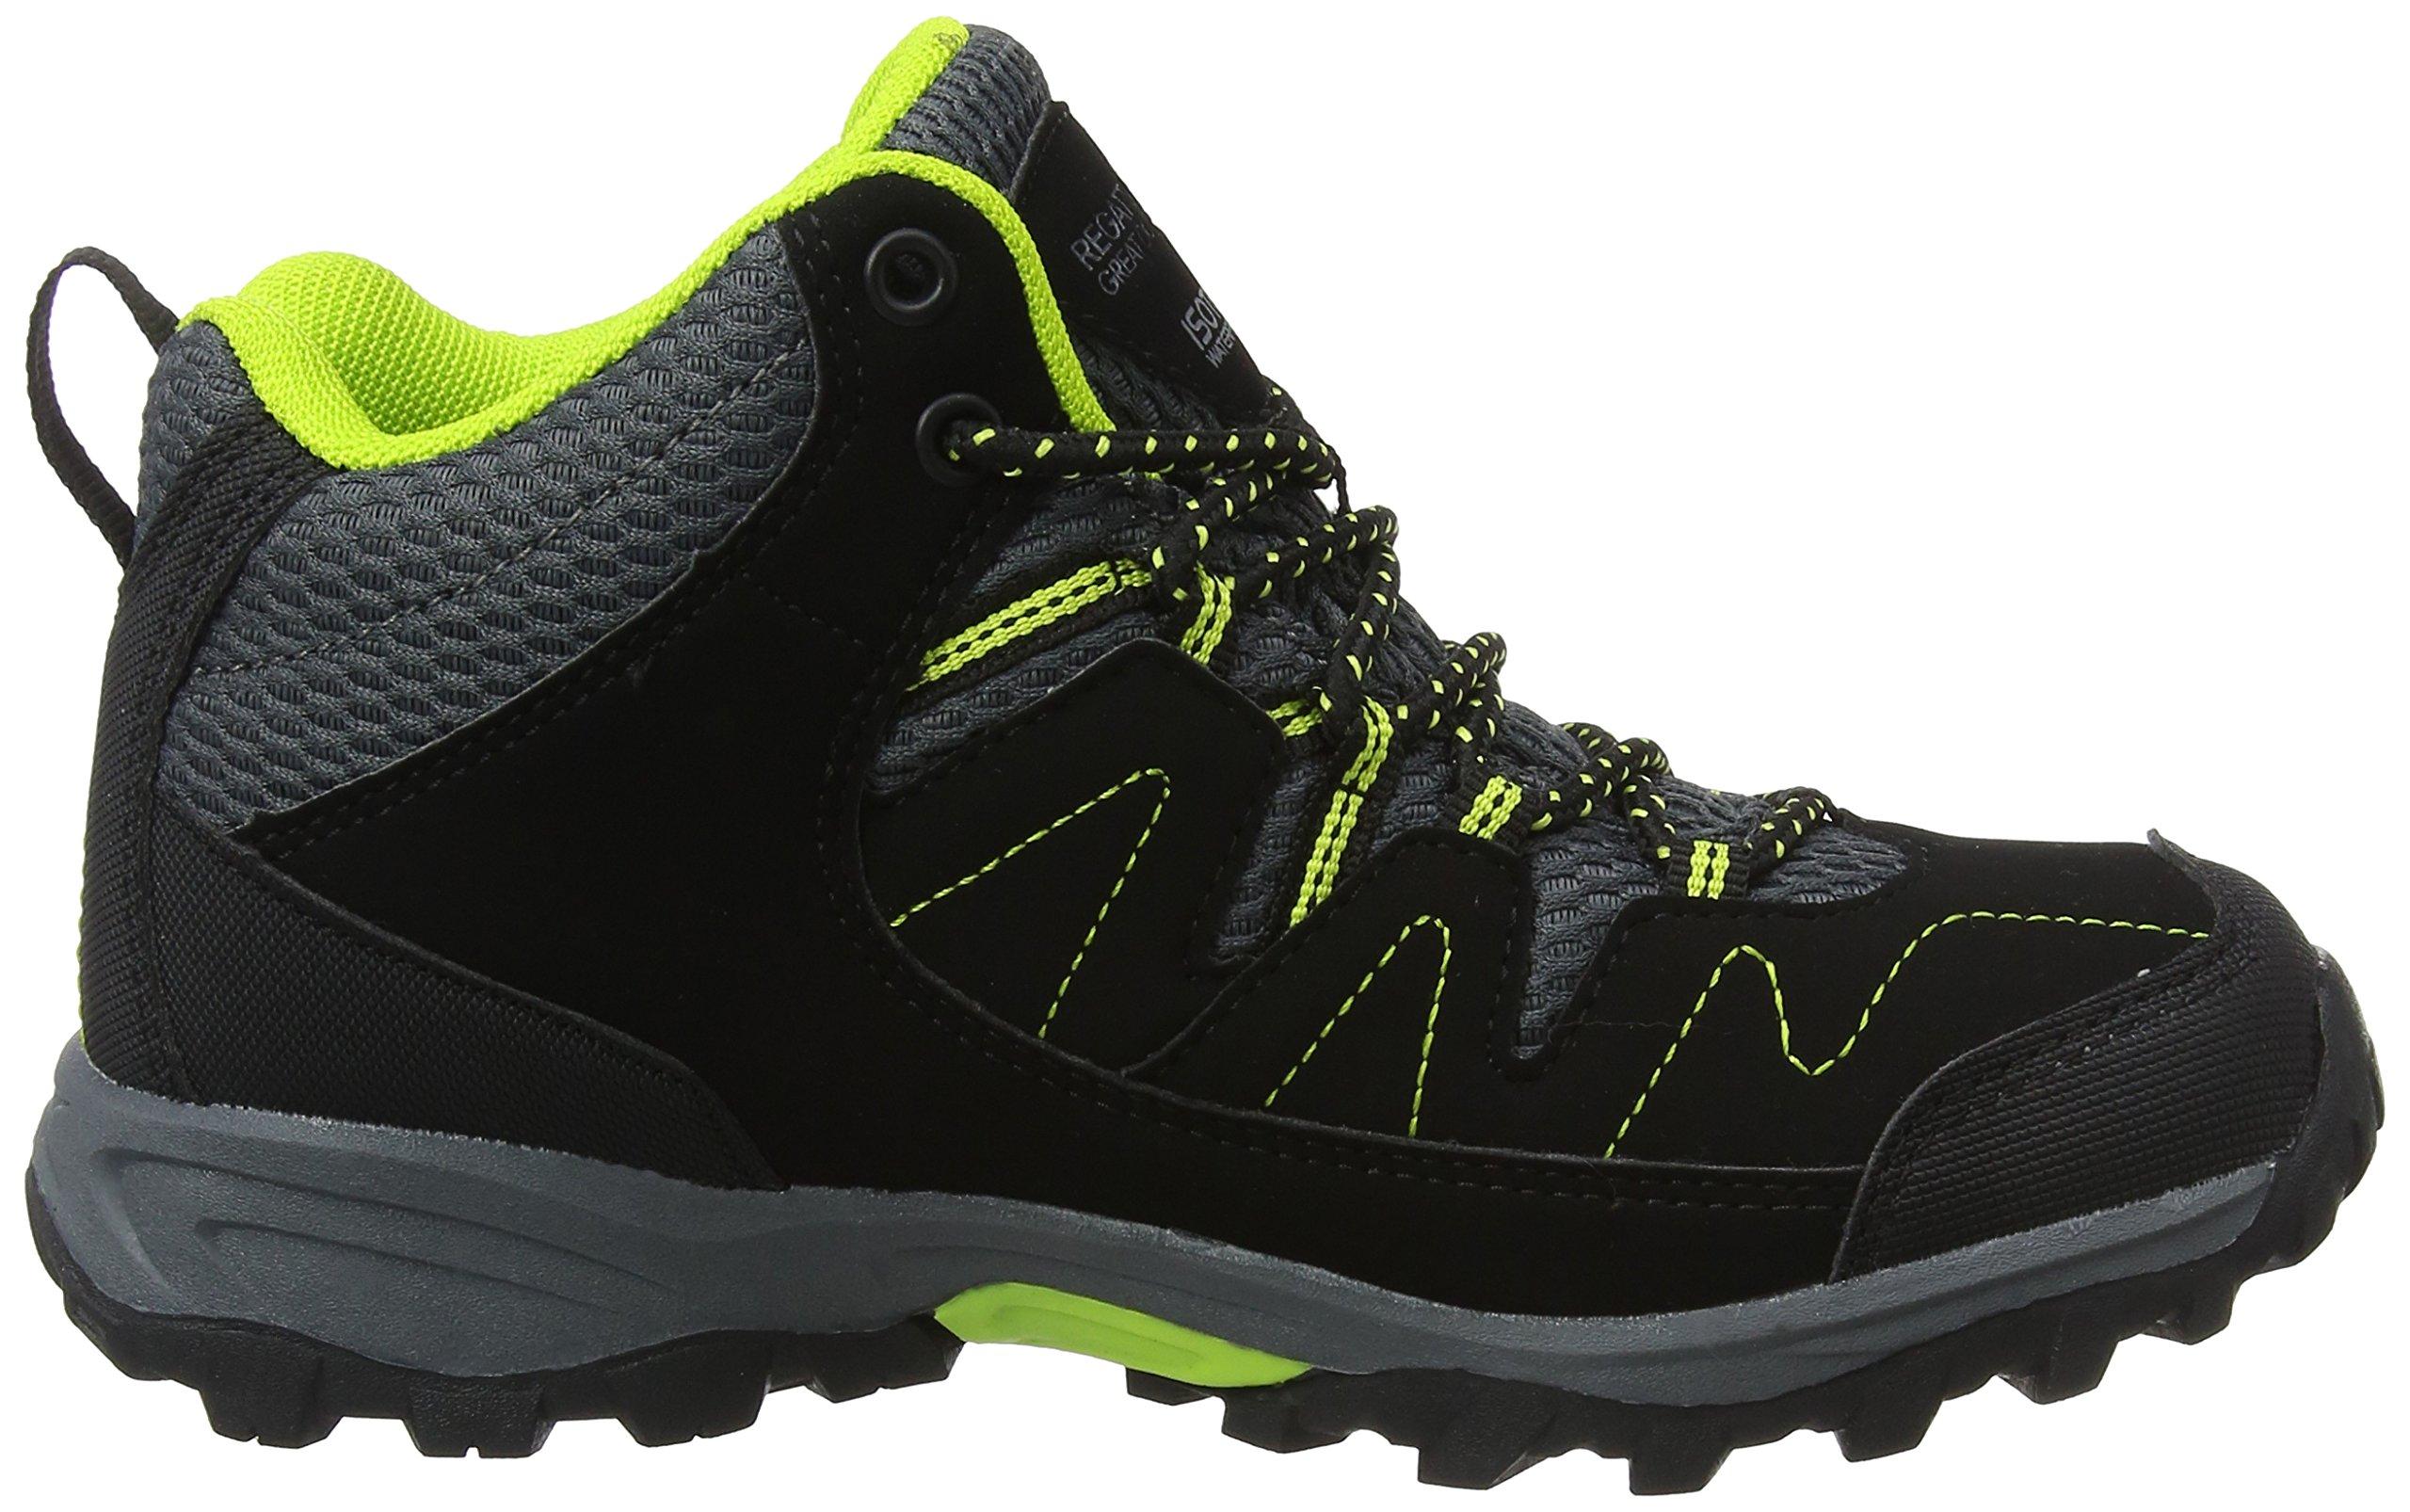 Regatta Holcombe Mid Jnr, Unisex Kids' High Rise Hiking Boots 6